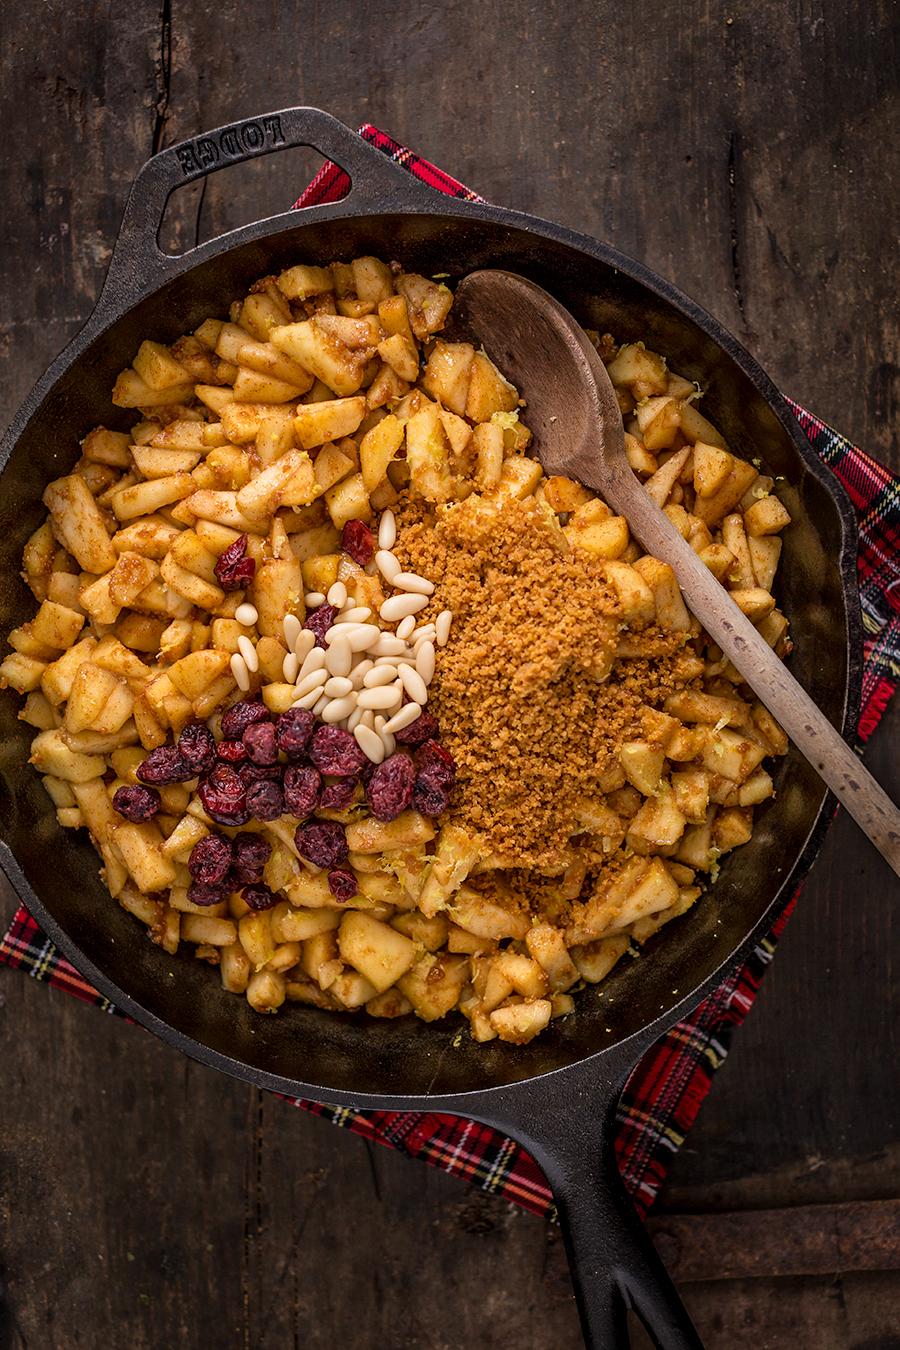 Healthy Vegan apple strudel recipe Ricetta Strudel di mele vegan senza uova senza burro ingredienti apfelstrudel